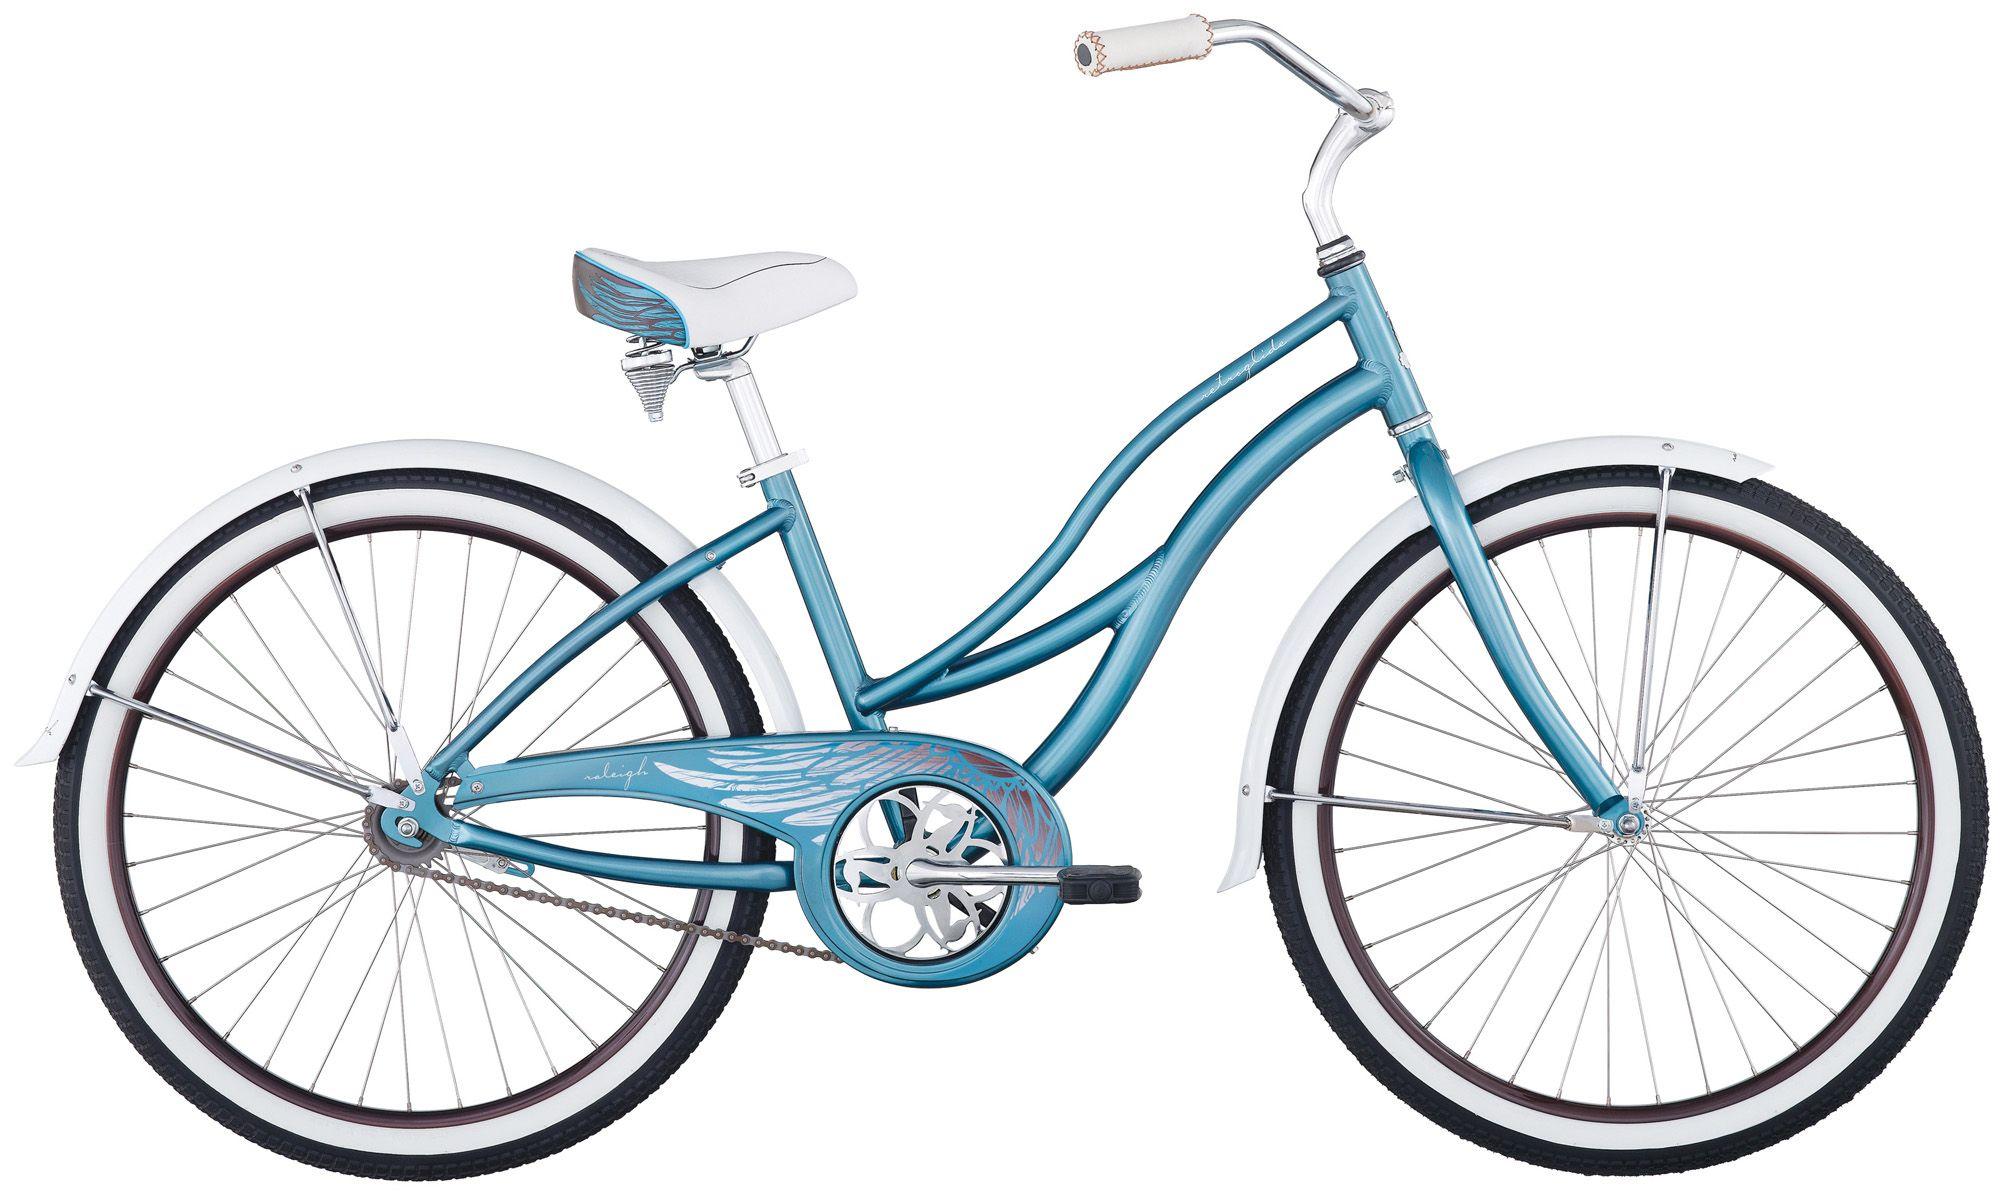 2011 Women S Retroglide 1 Cruiser Bike I Want This Raleigh Bicycle Bicycle Cruiser Bike